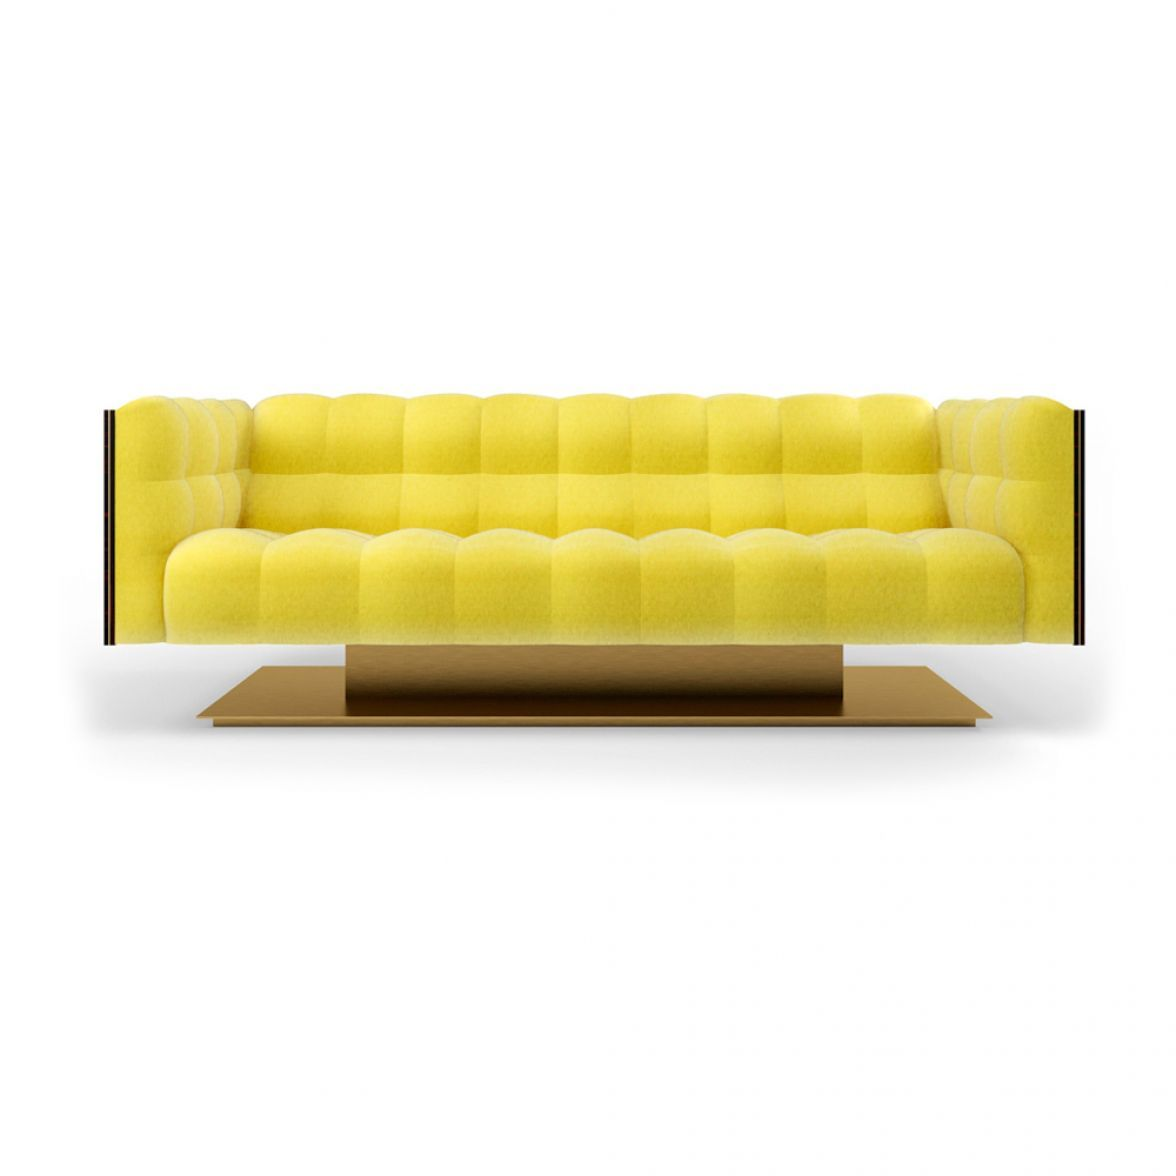 Montgomery sofa фото цена